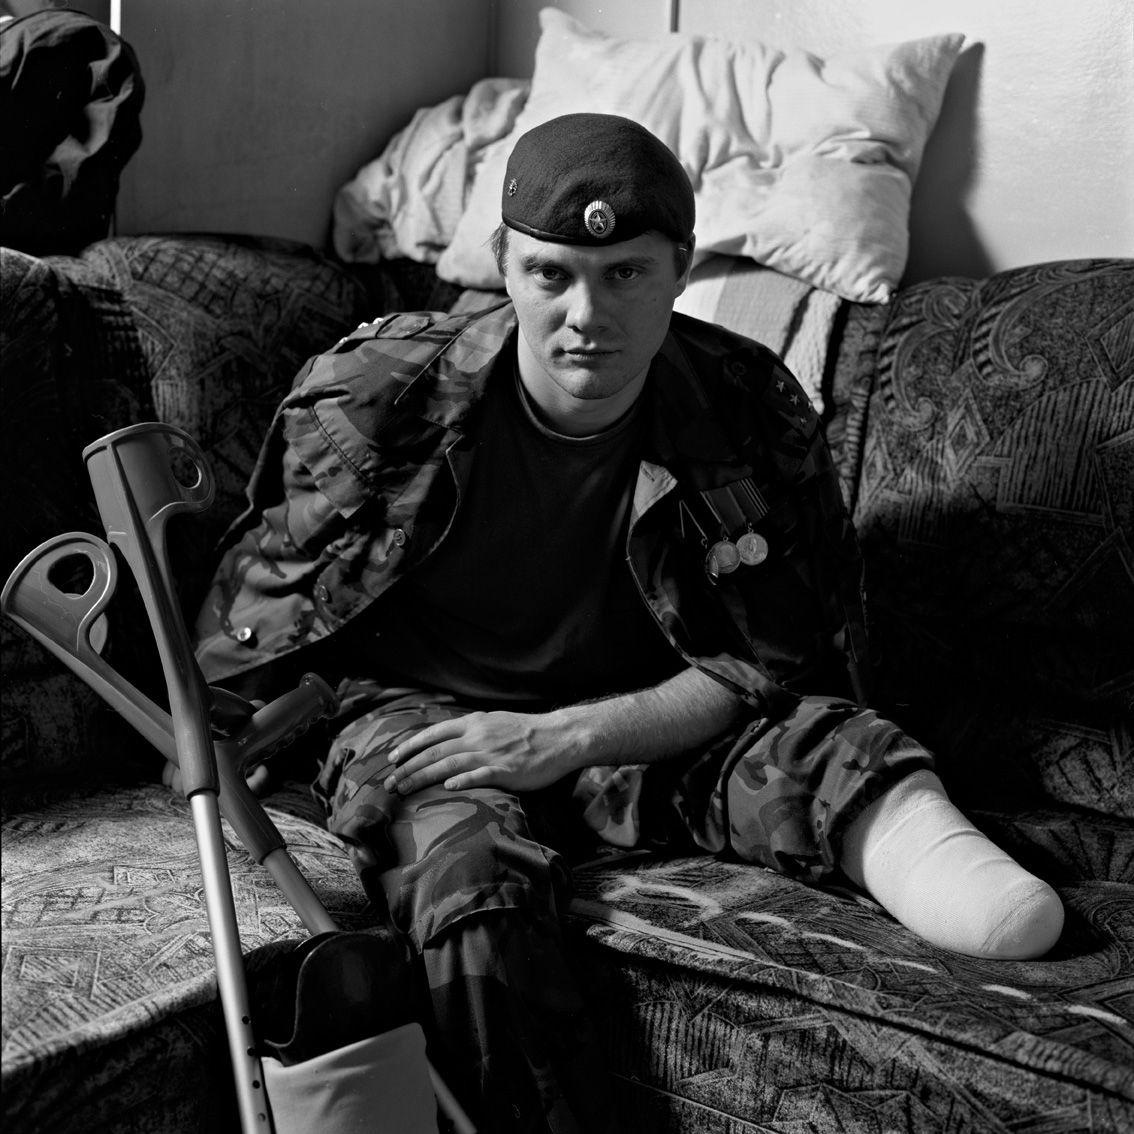 VETERANS OF SPETSNAZ: PORTRAITS OF SECRET SOLDIERS - 6